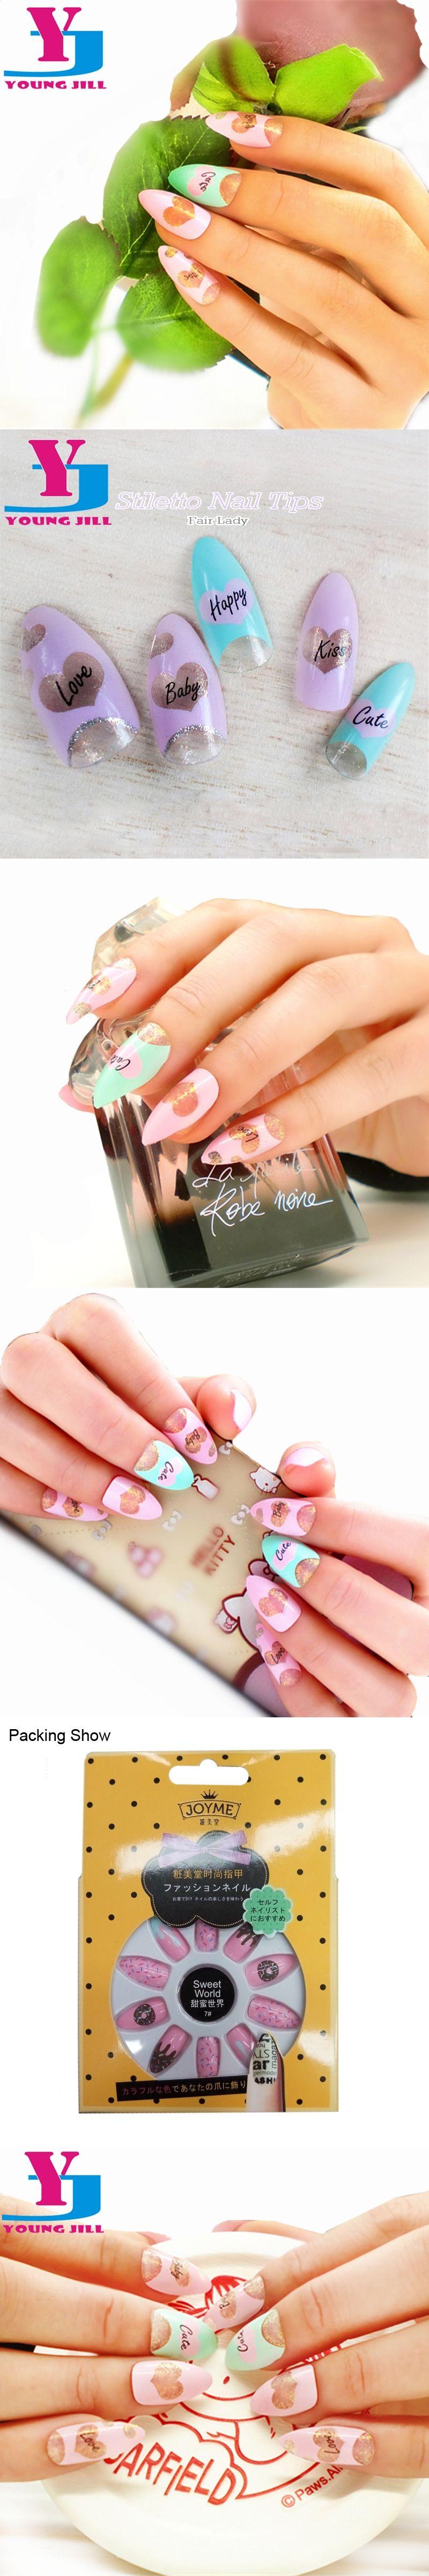 24 pcs/set Decorated False Nails Pre Design Acrylic Fake Nails Full ...